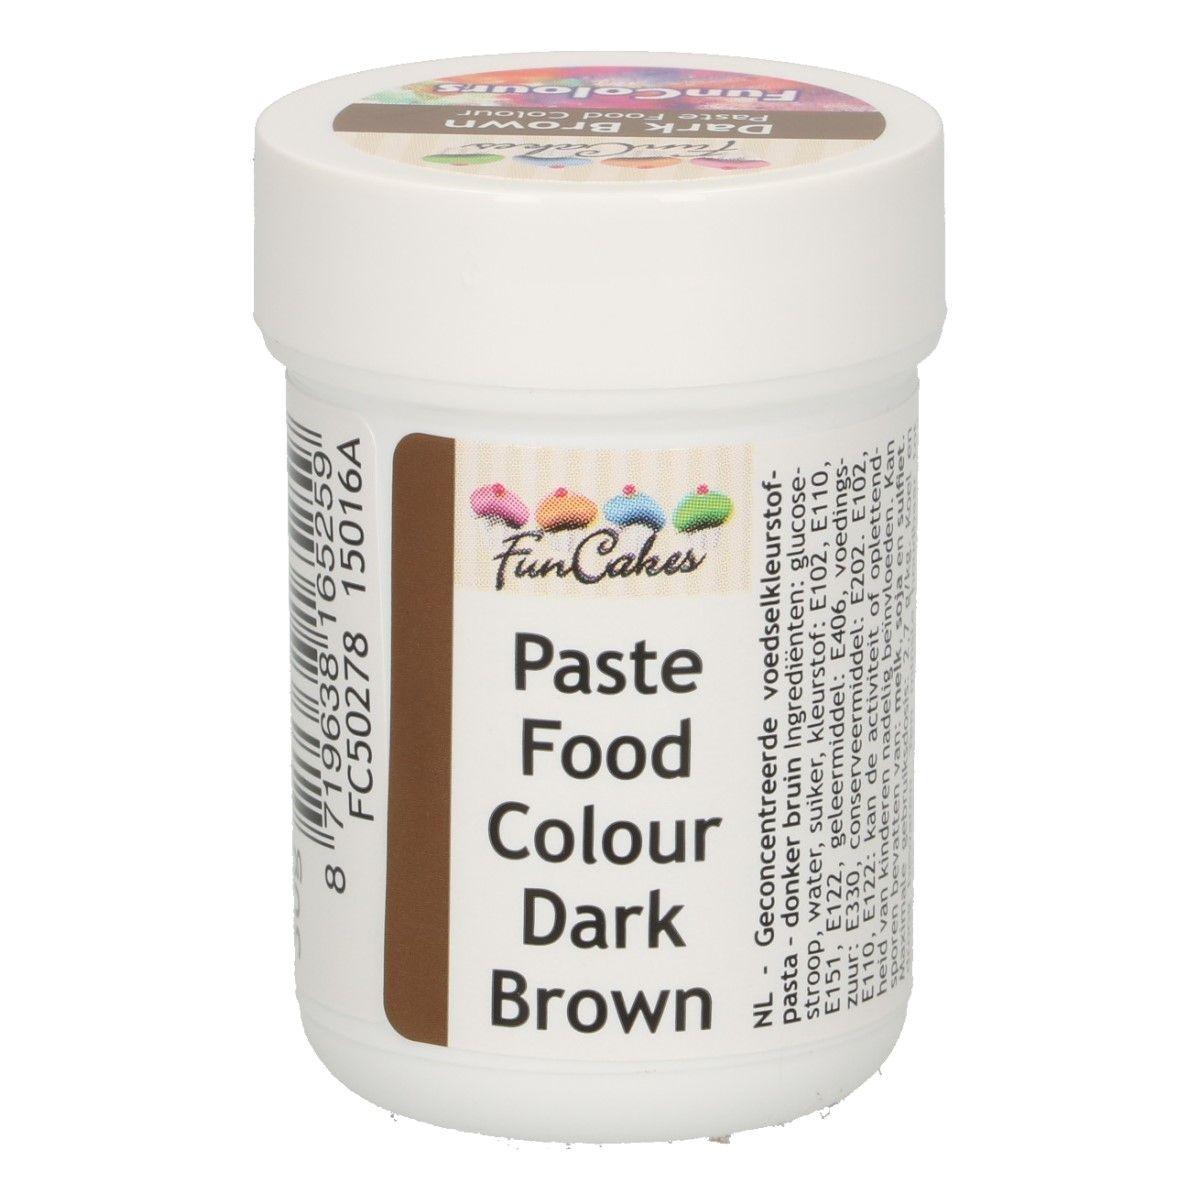 /f/u/funcakes-funcolours-paste-food-colour-dark-brown.jpg